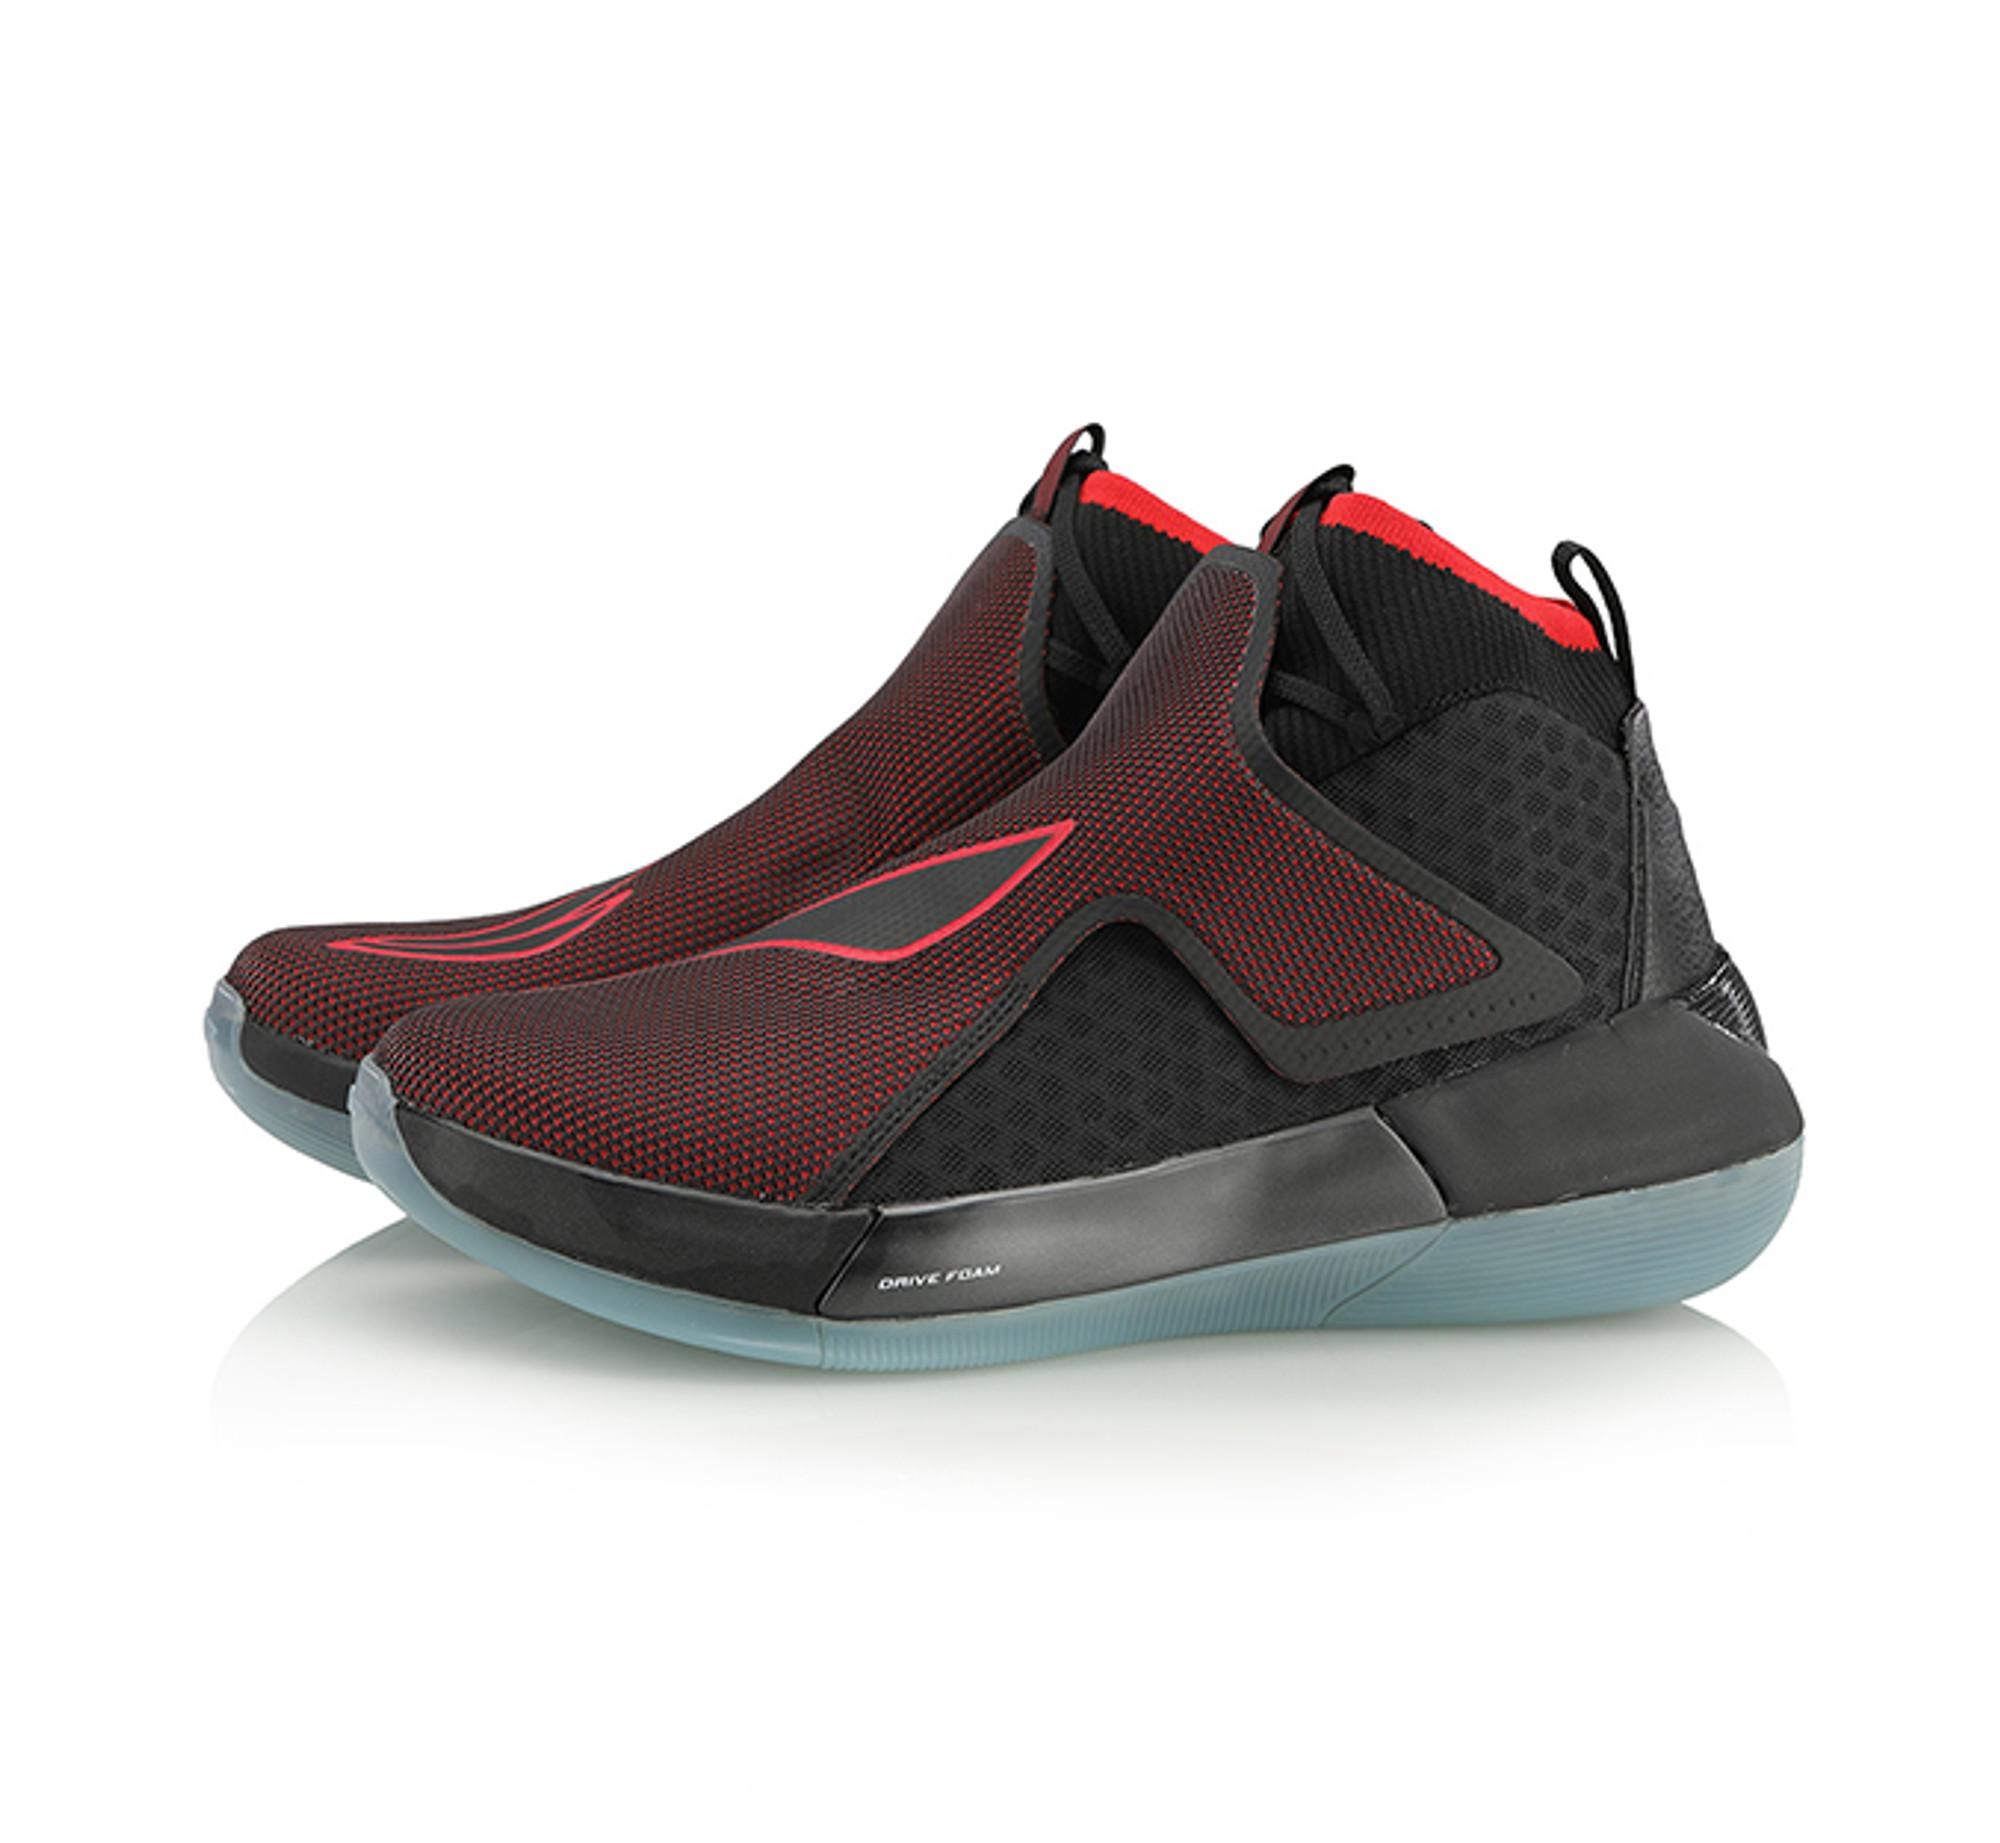 finest selection 0ee57 082b8 ... Li-Ning Basketball Shoe